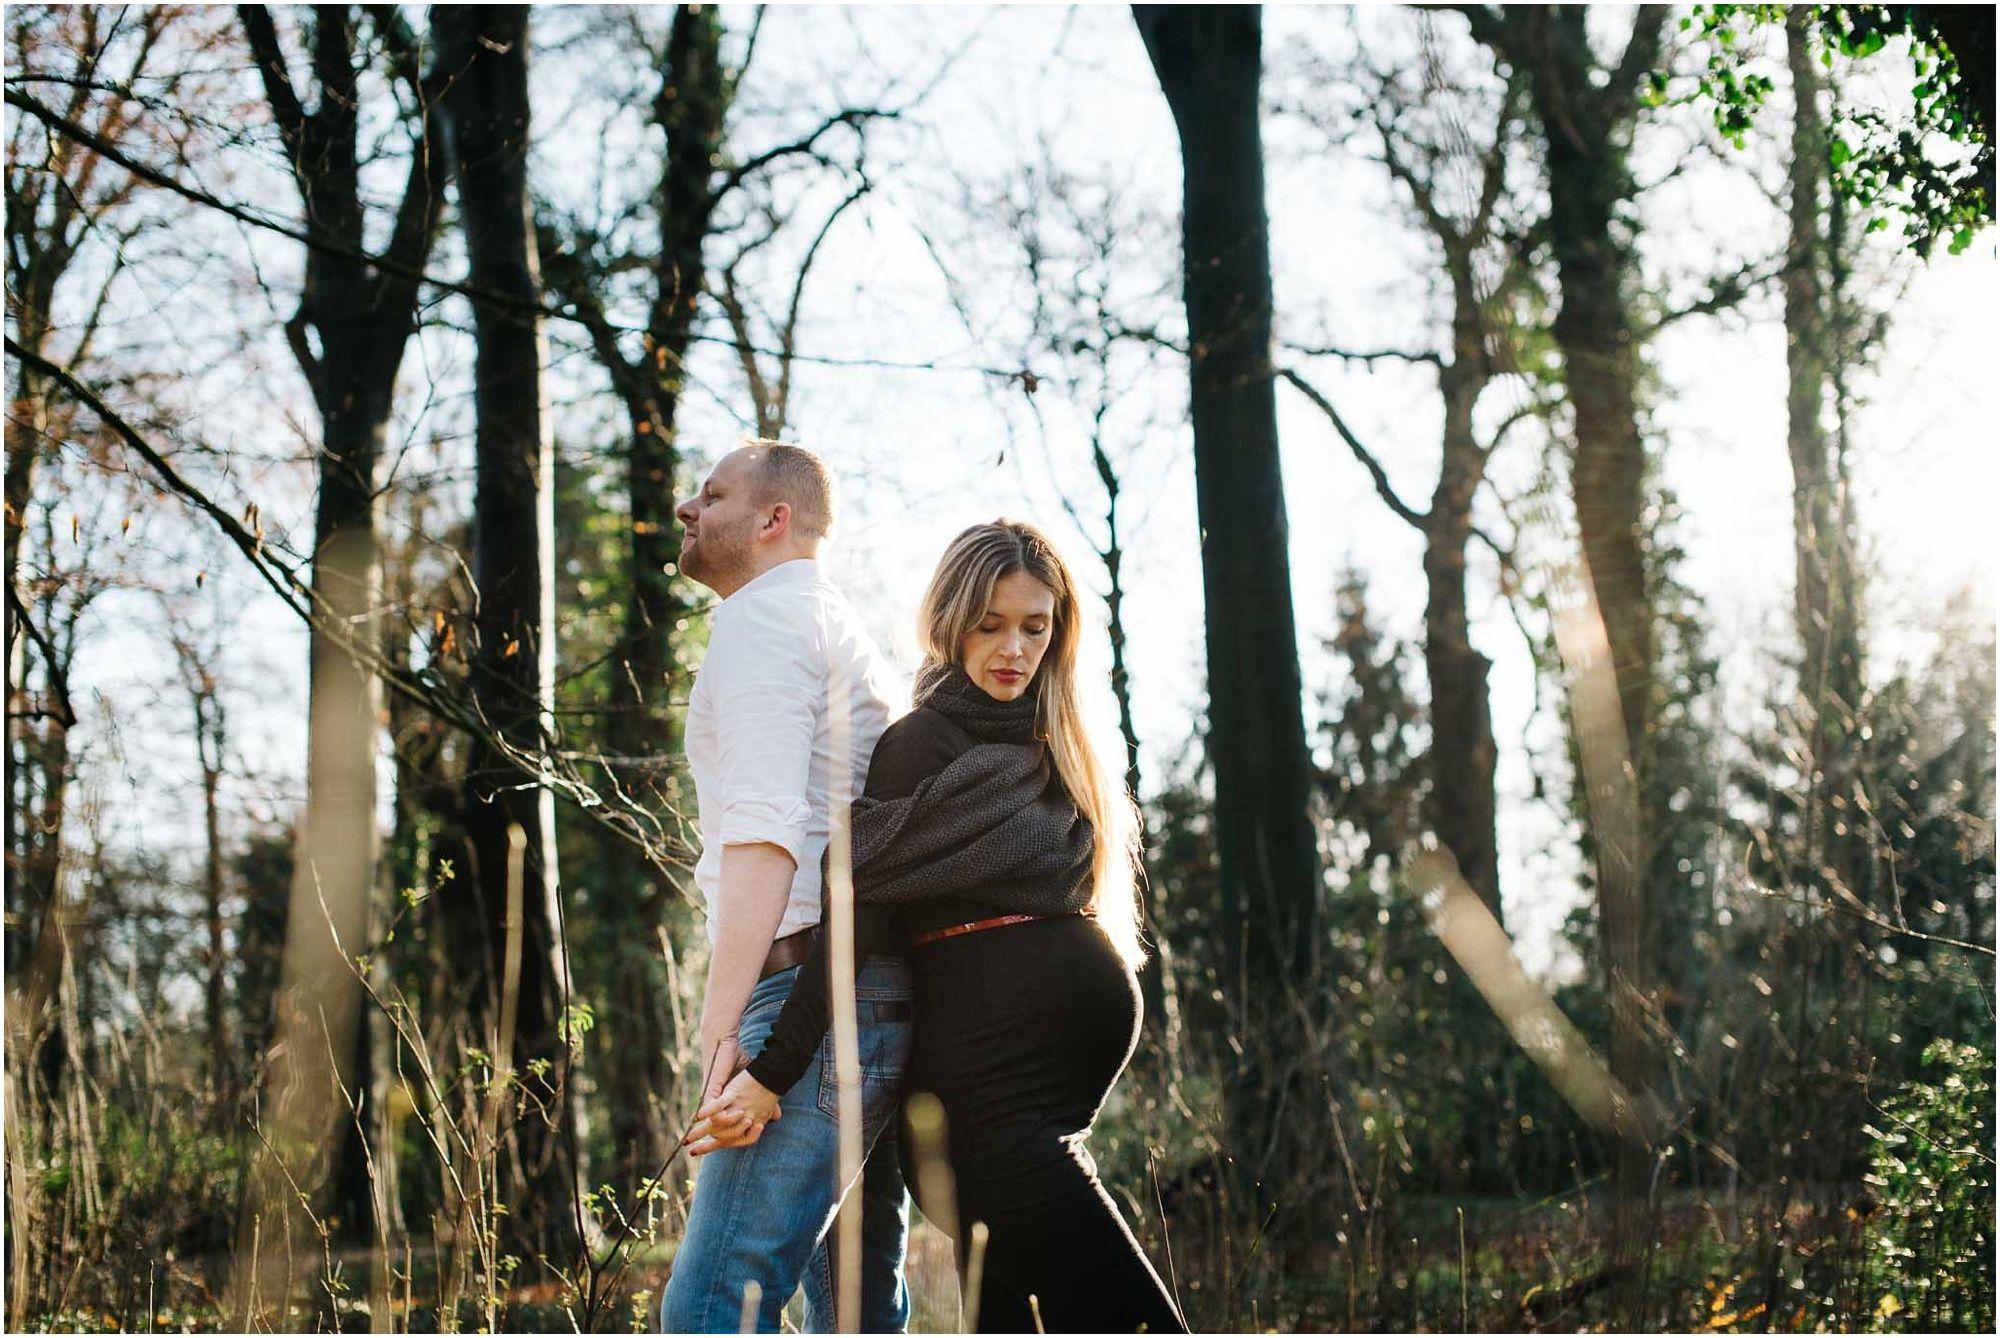 stoere zwangerschapsfotografie Den Bosch fotograaf zwangerschap fotoshoot met partner